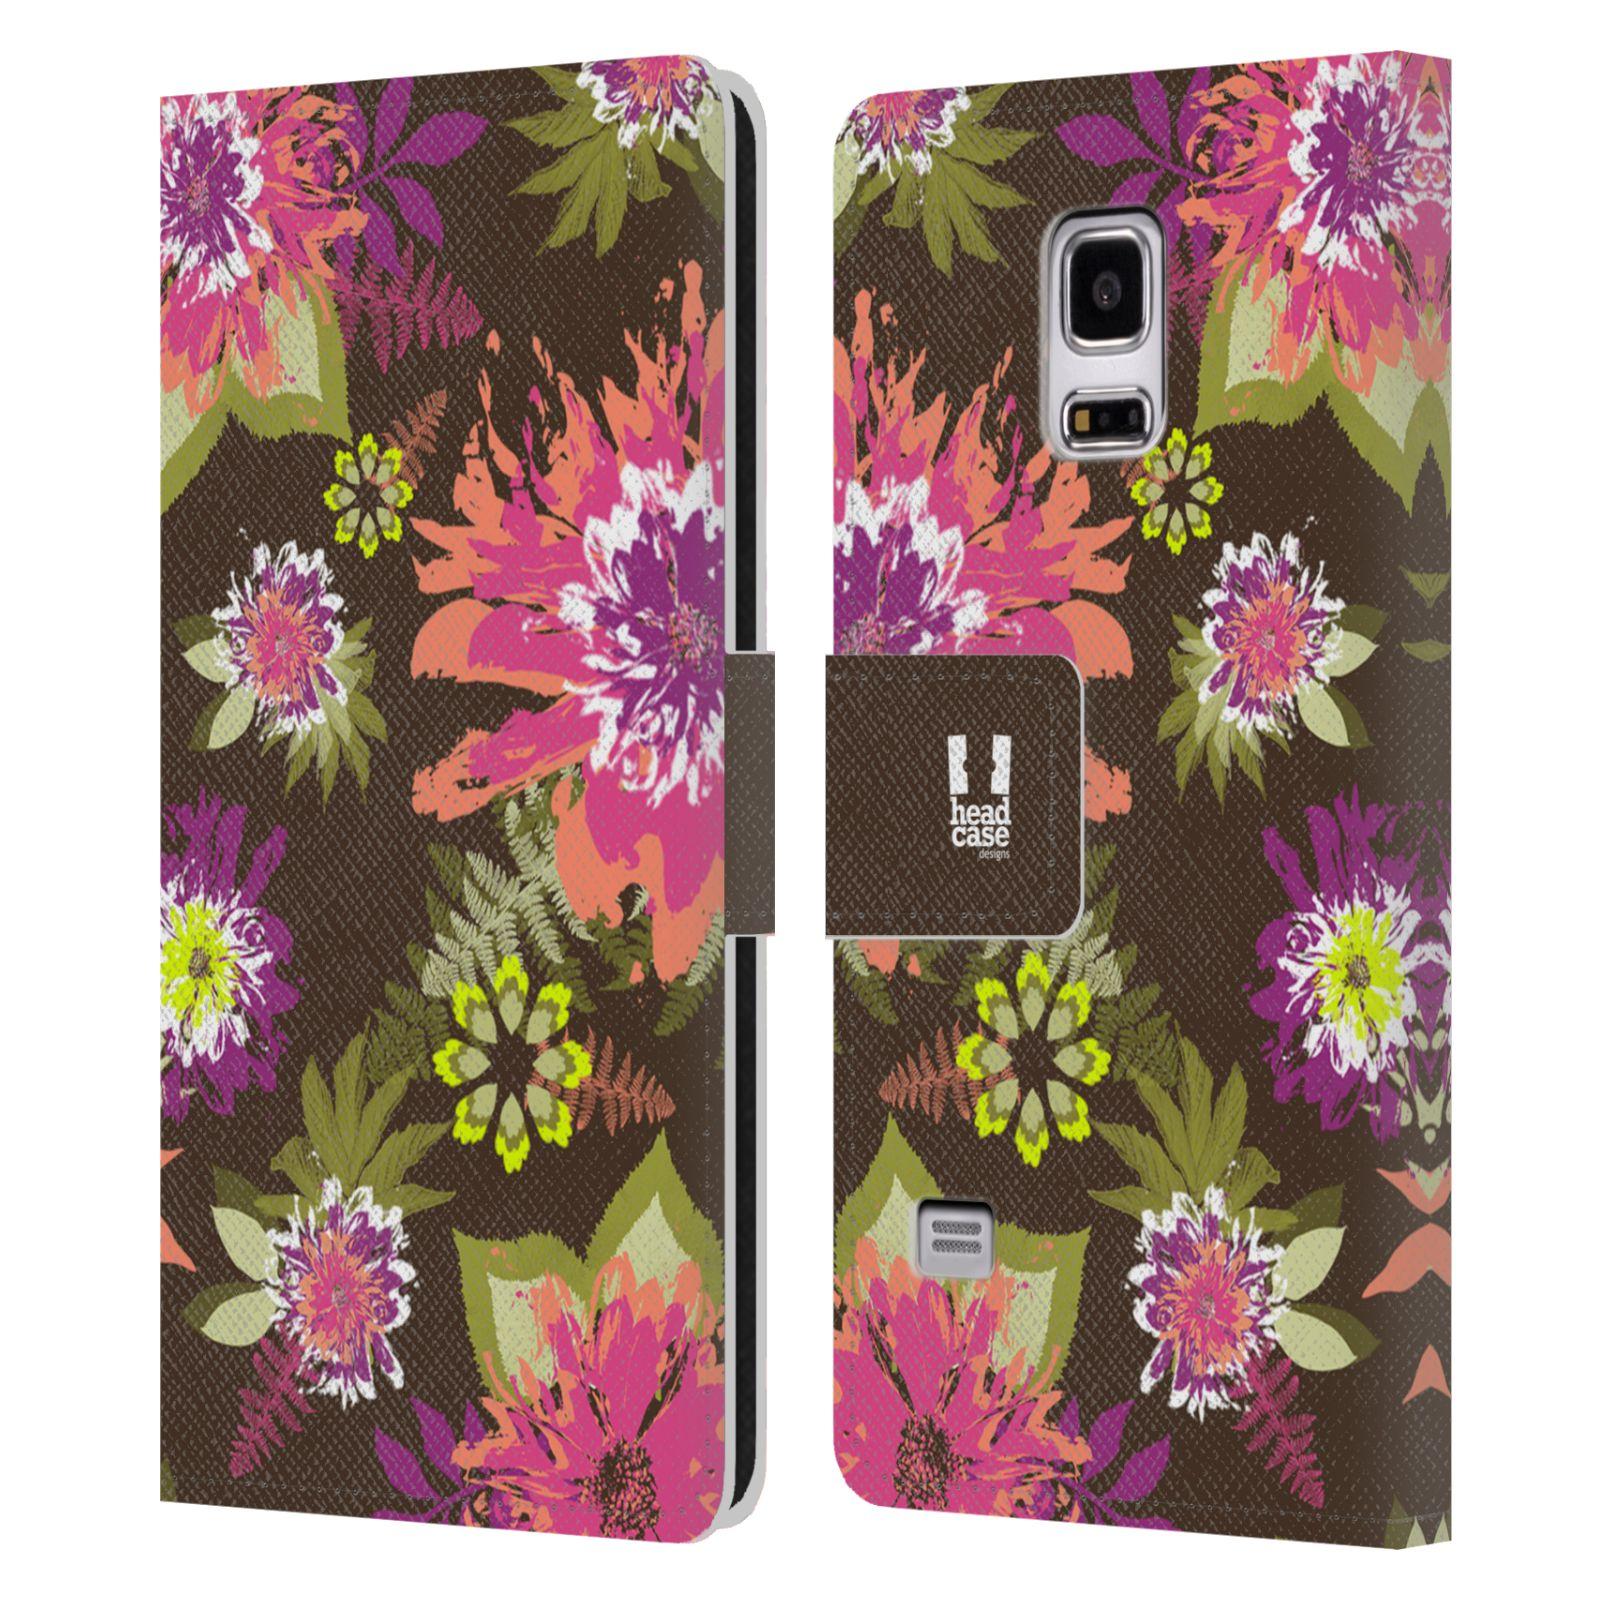 HEAD CASE Flipové pouzdro pro mobil Samsung Galaxy S5 MINI / S5 MINI DUOS BOTANIKA barevné květy zelená